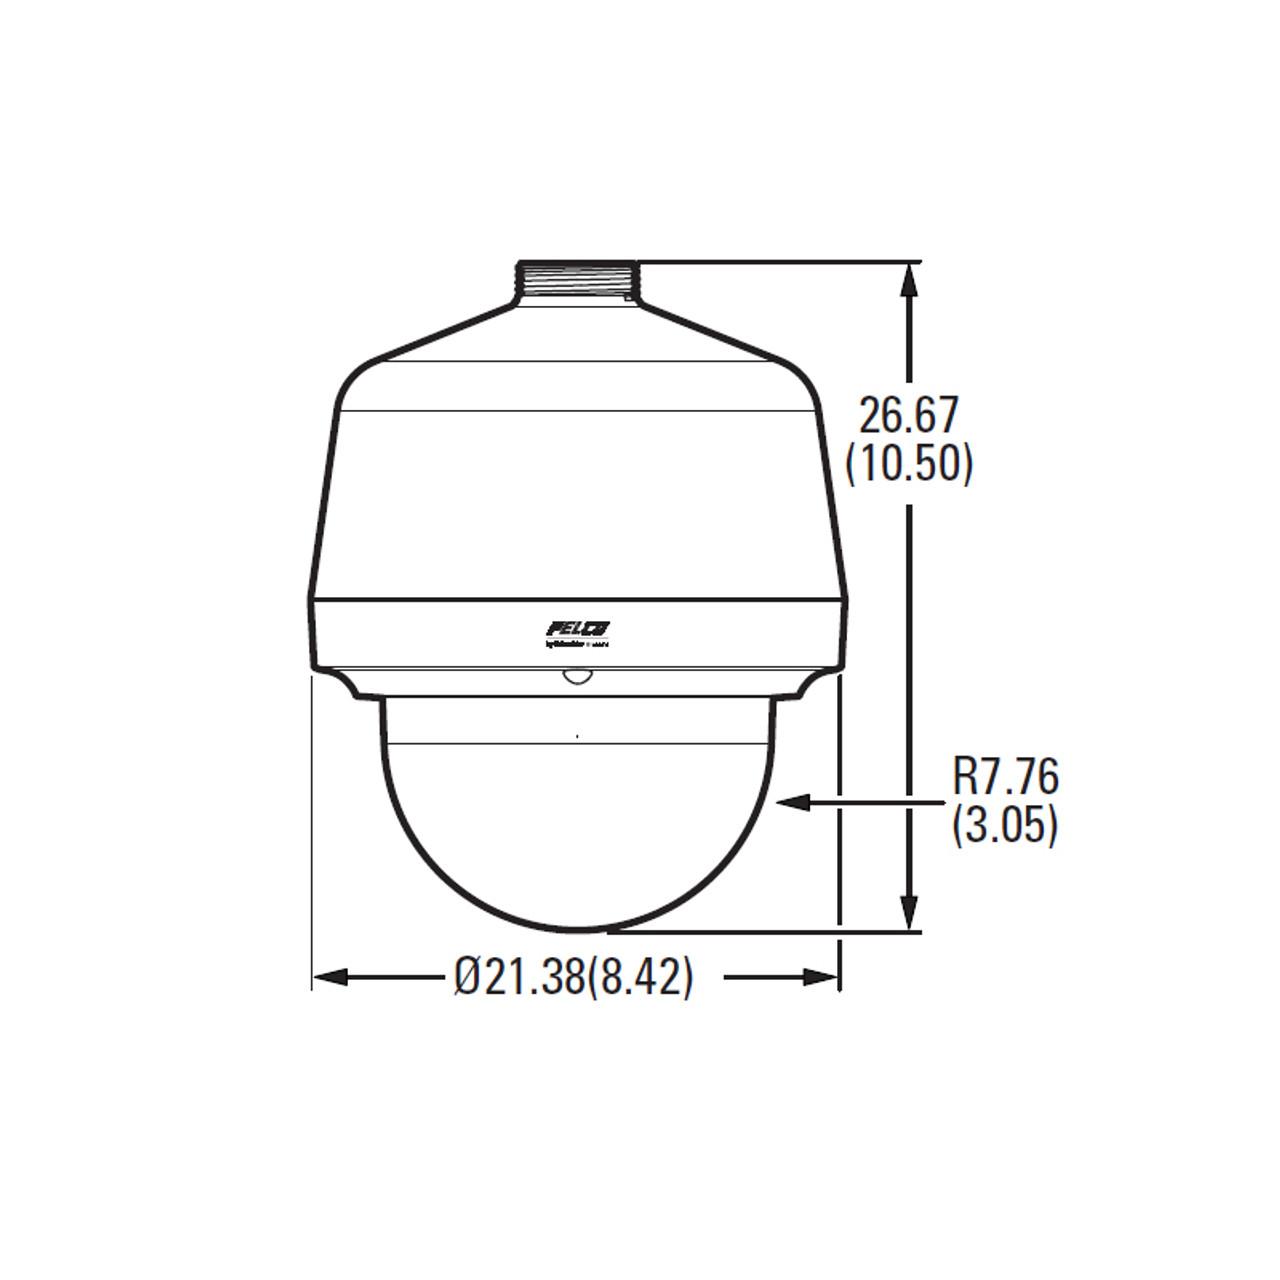 small resolution of pelco ptz camera wiring diagram